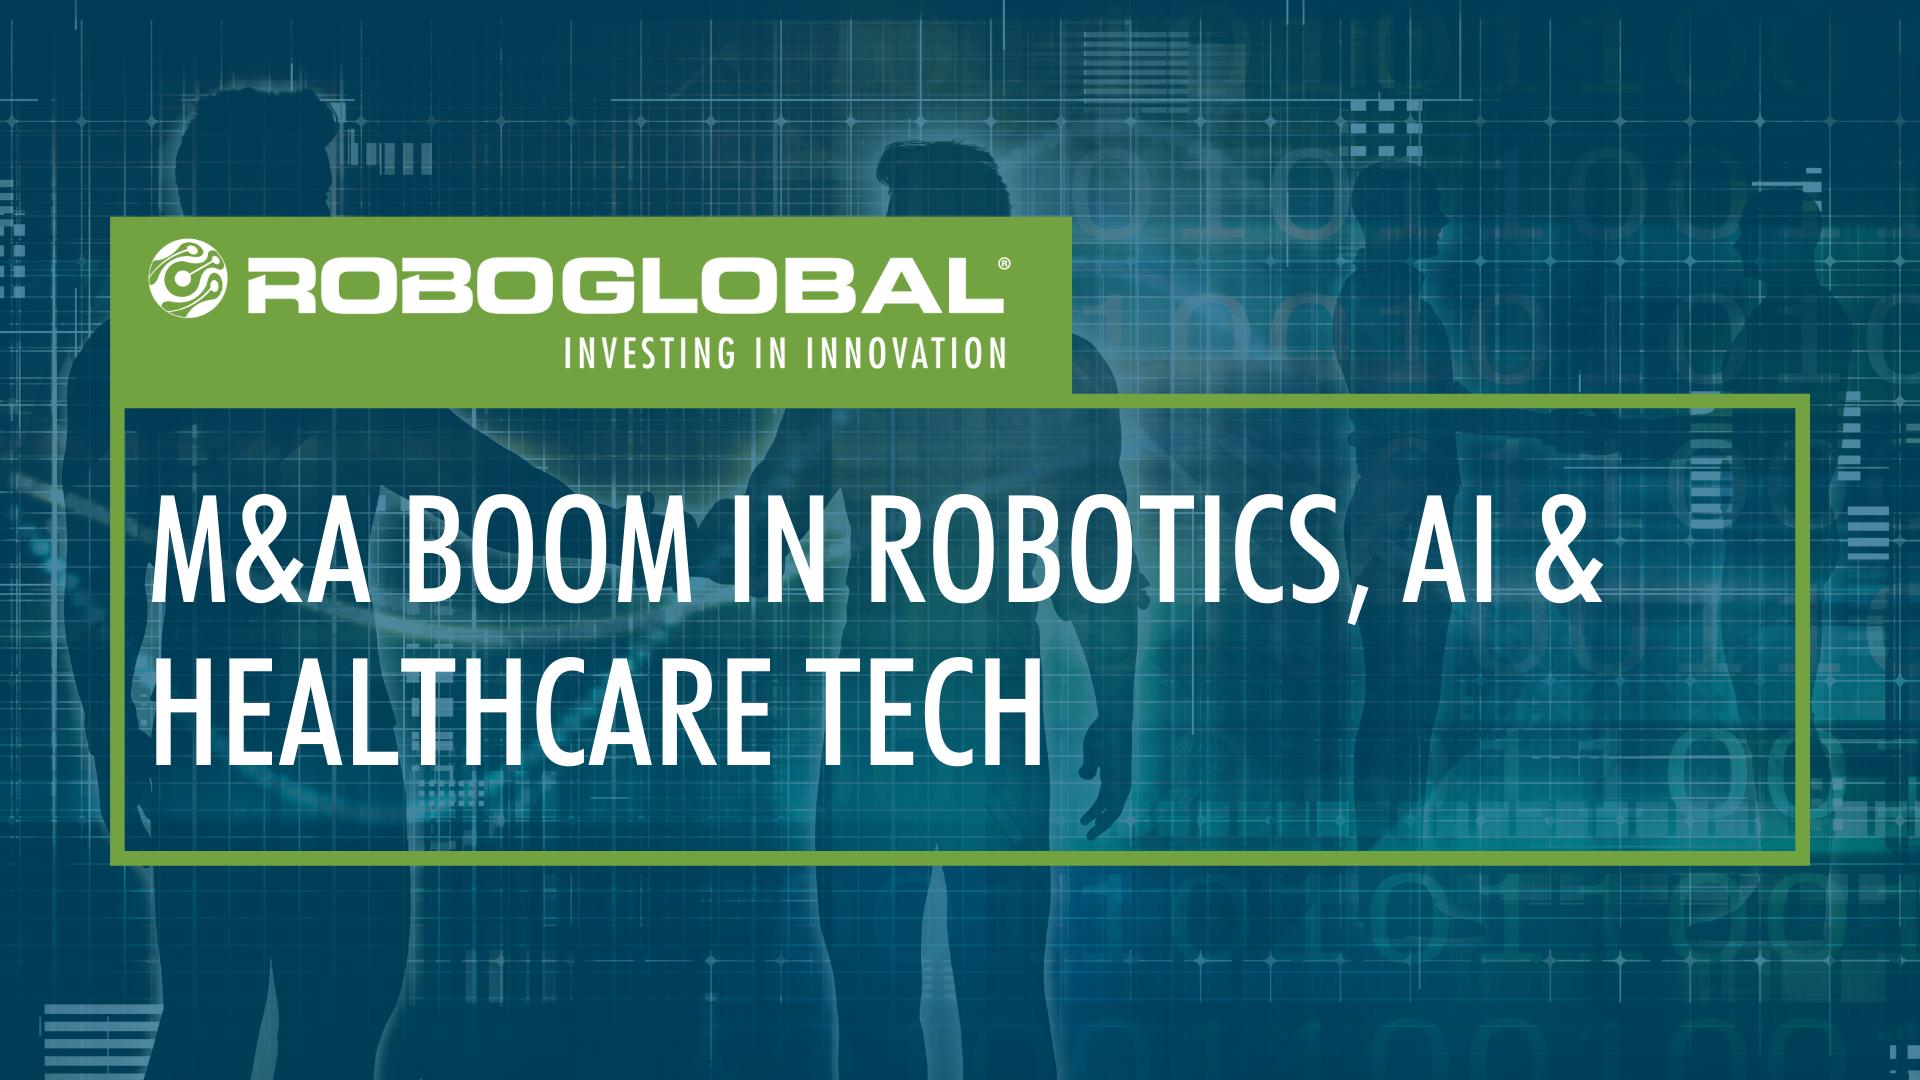 Follow the Money: M&A Boom in Robotics, AI & Healthcare Technology